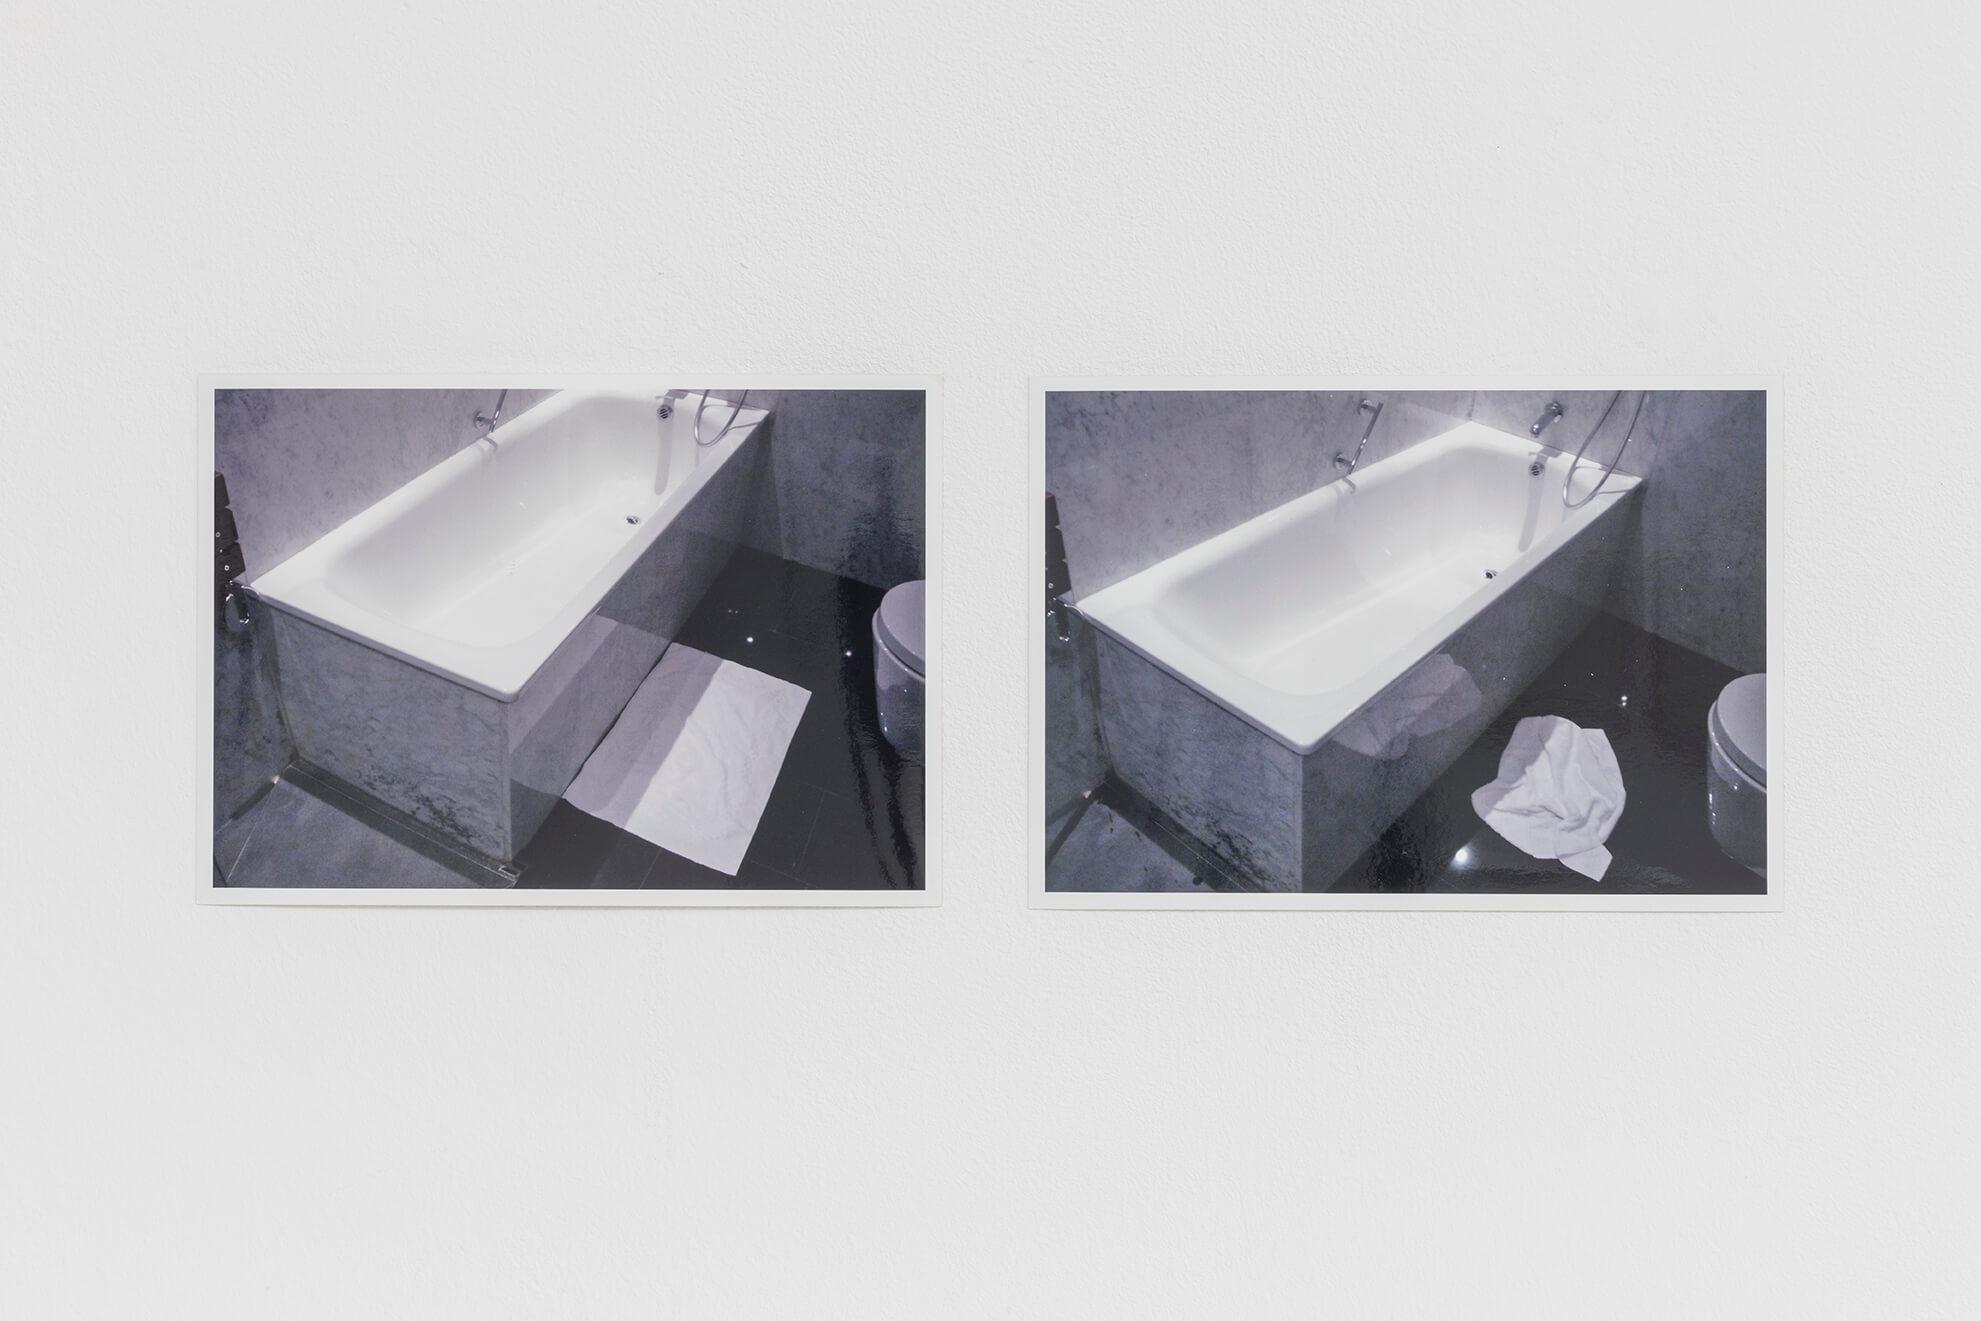 HANS-PETER FELDMANN. Before_After (Badewanne), 1990 | Lara Fluxà: Delu / Accrochage #5: Set Petites Històries | ProjecteSD